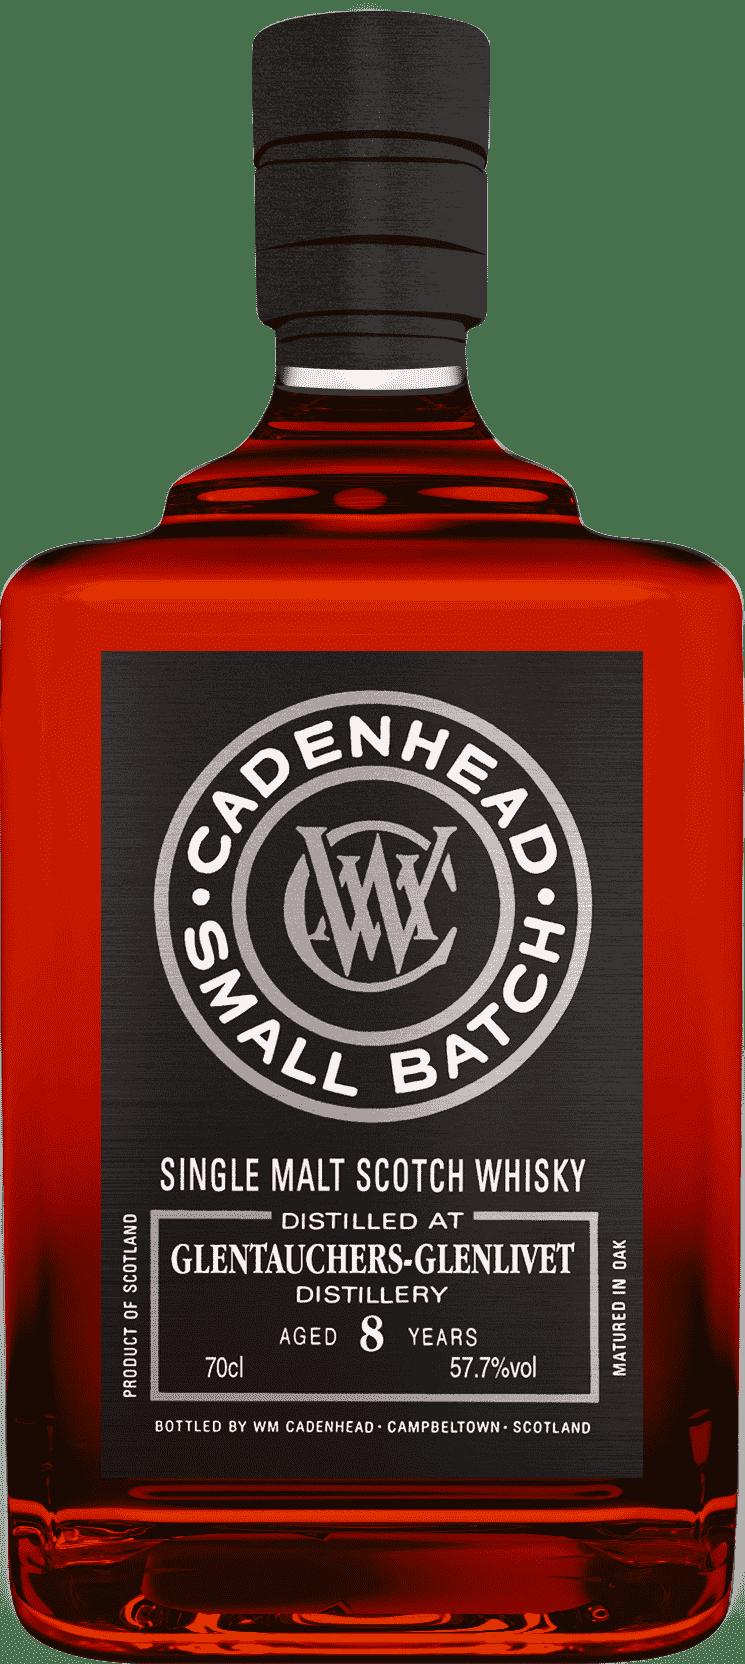 A Bottle of Glentauchers-8-YO